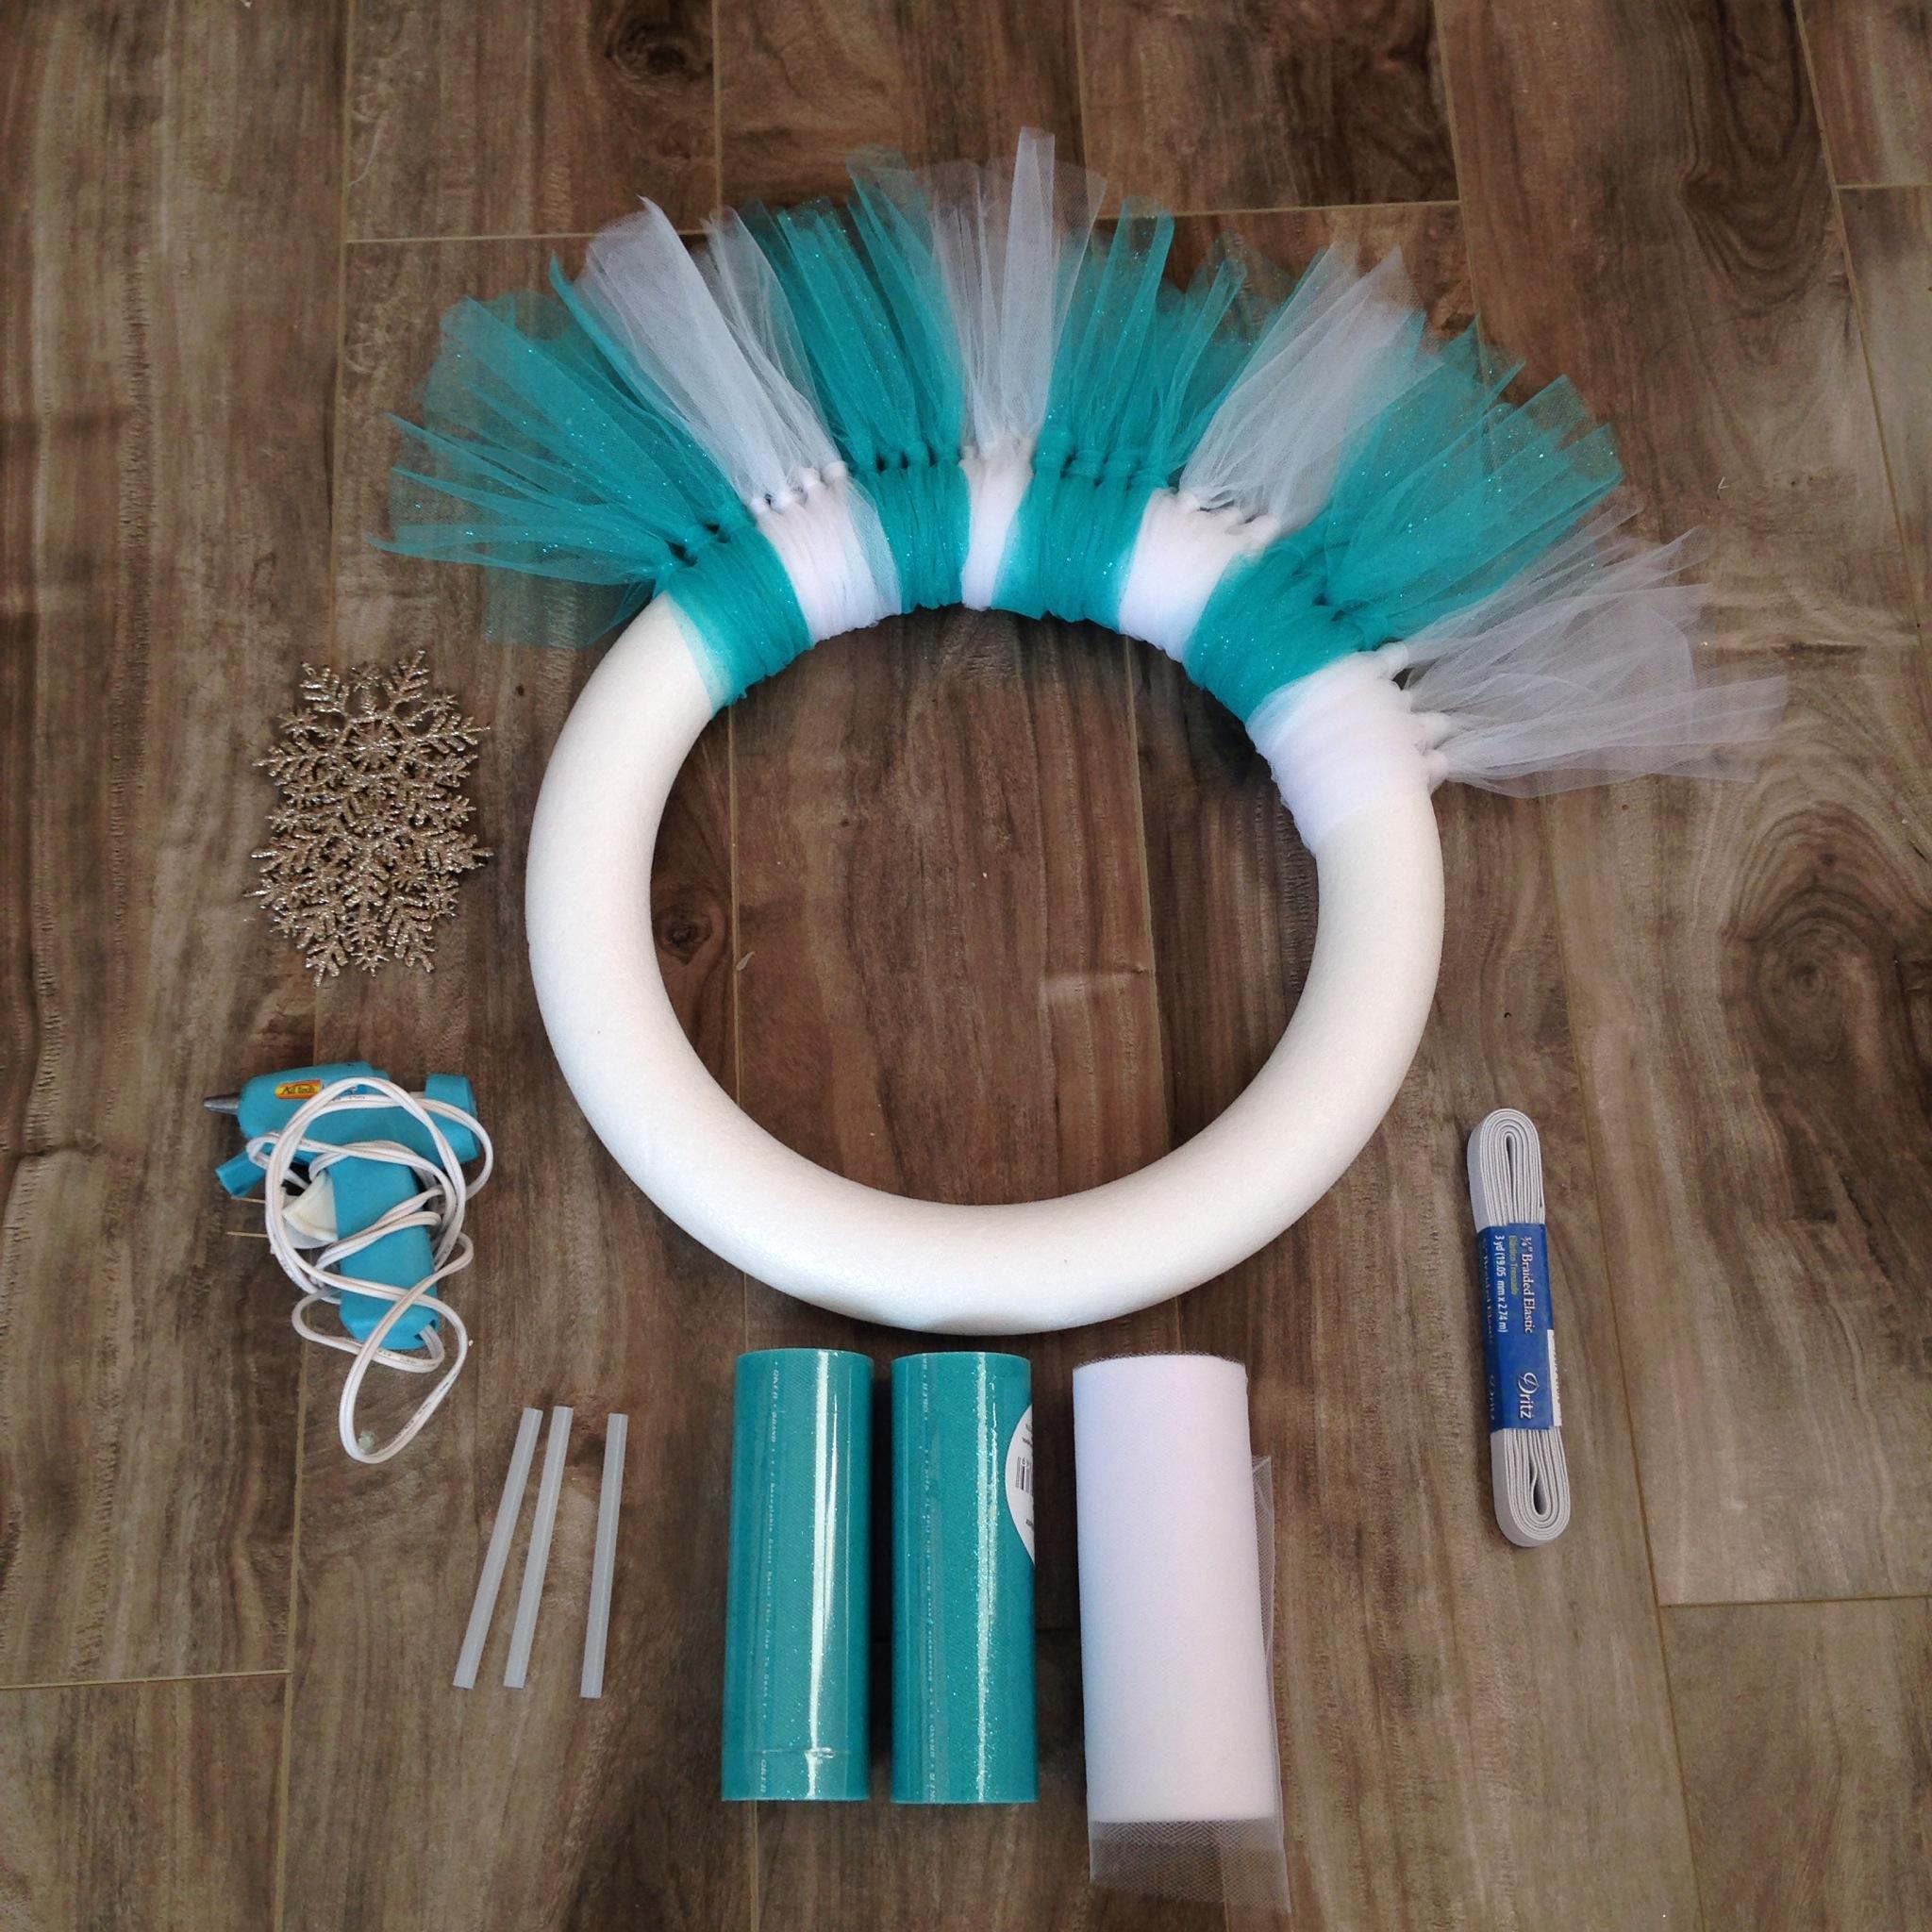 DIY Frozen Inspired Tulle Wreath!